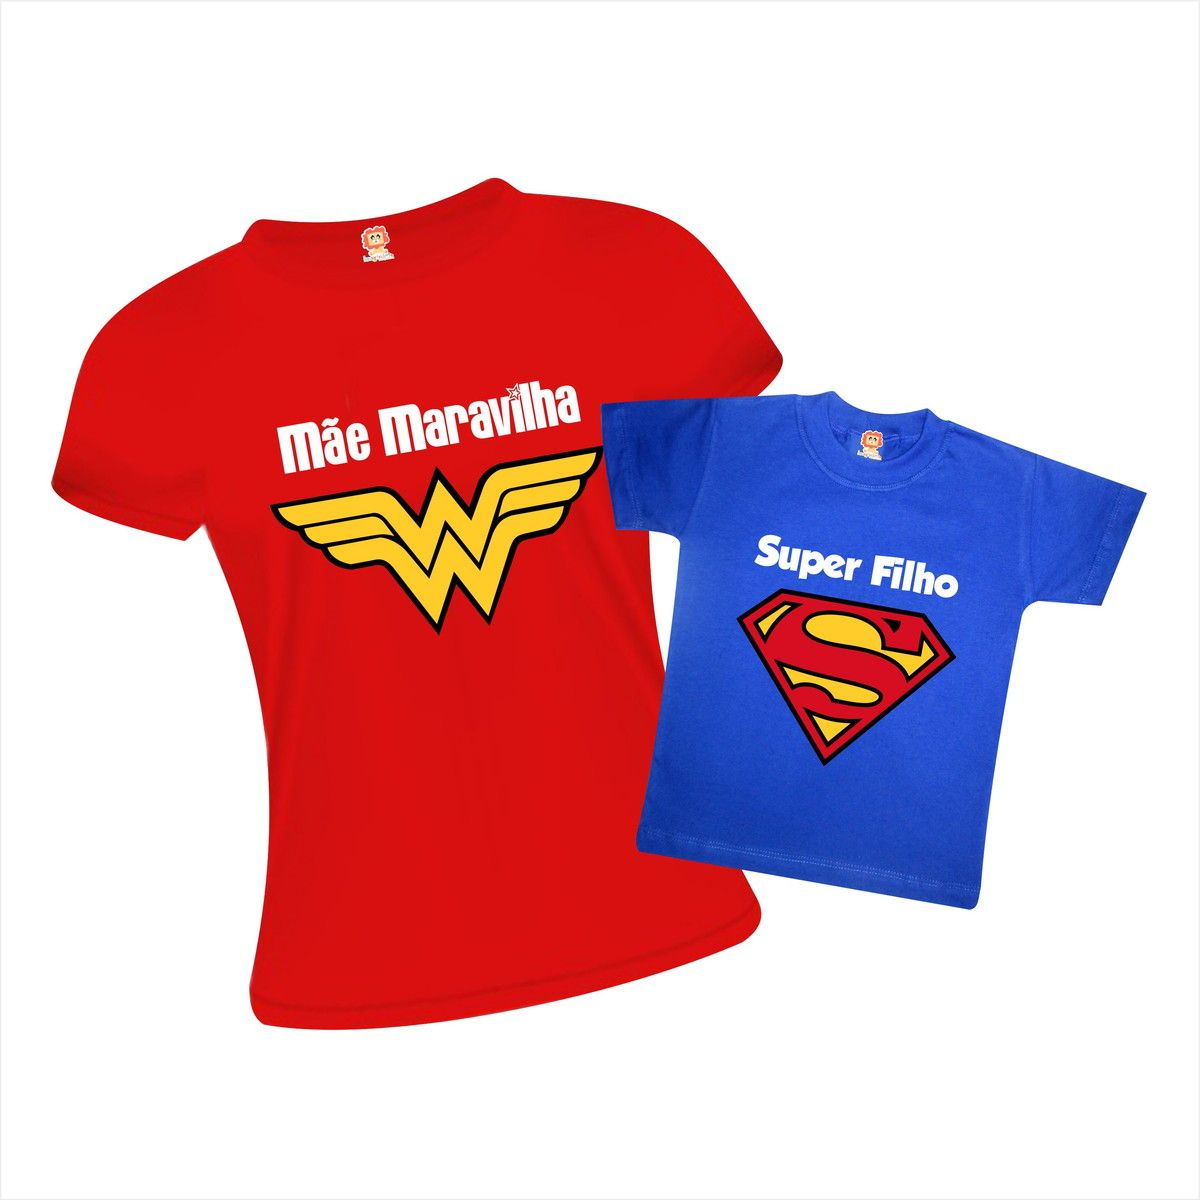 Kit Camiseta e Body Mãe Maravilha e Super Filho